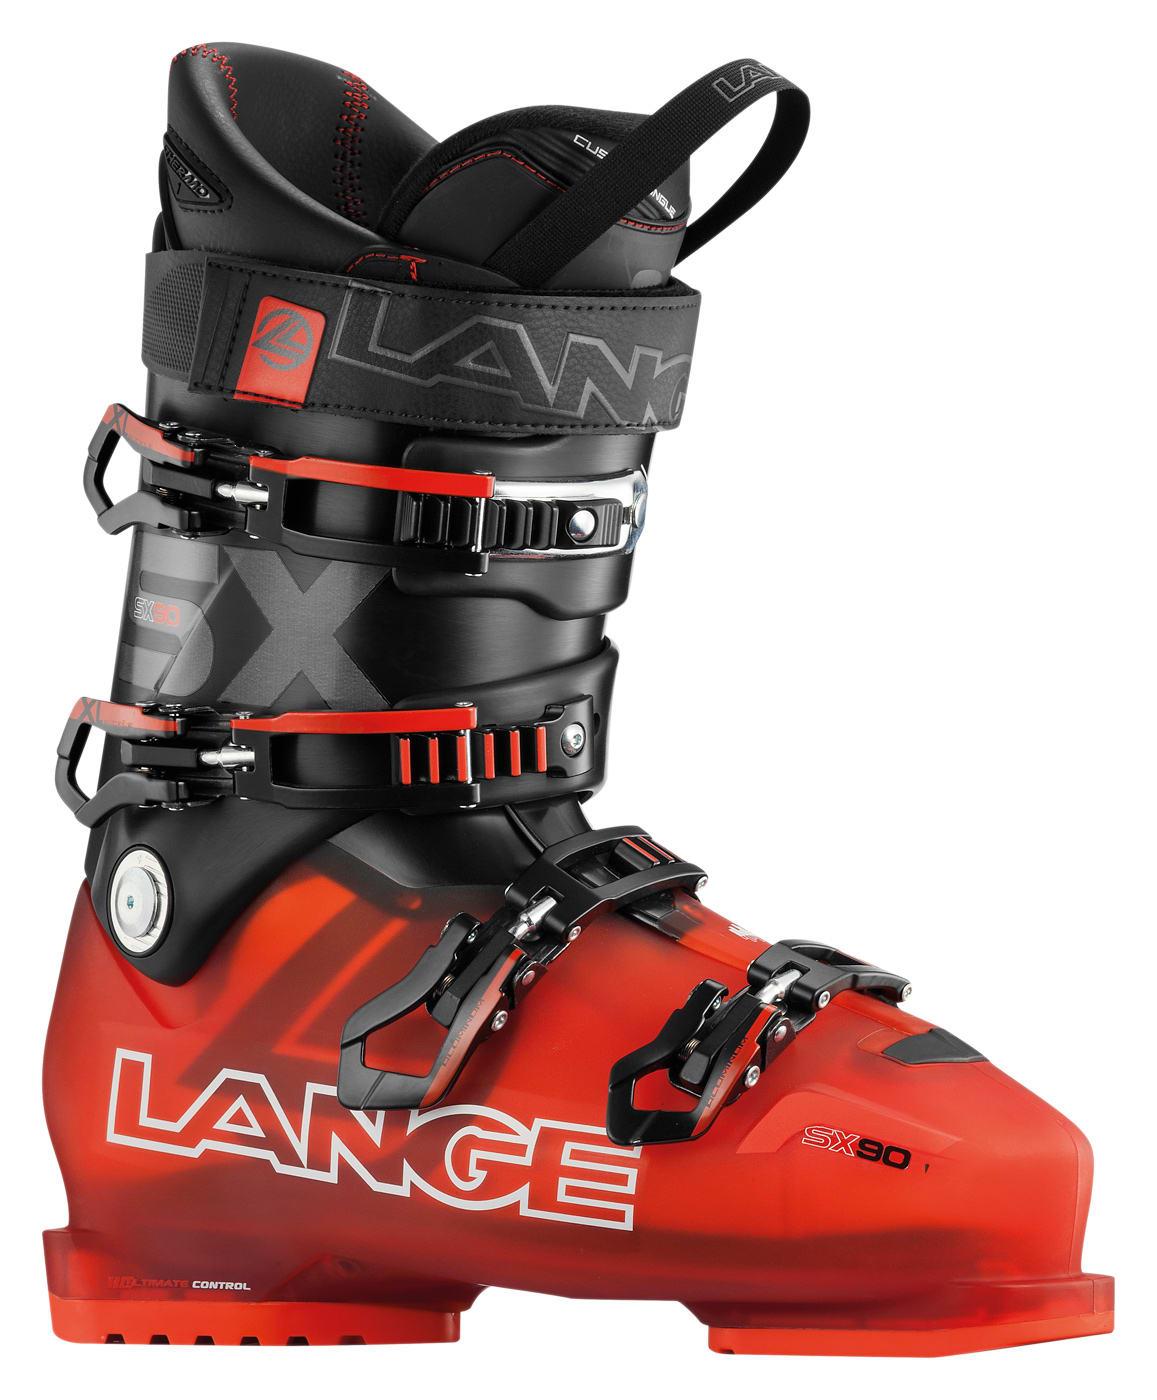 on sale lange sx 90 ski boots 2017